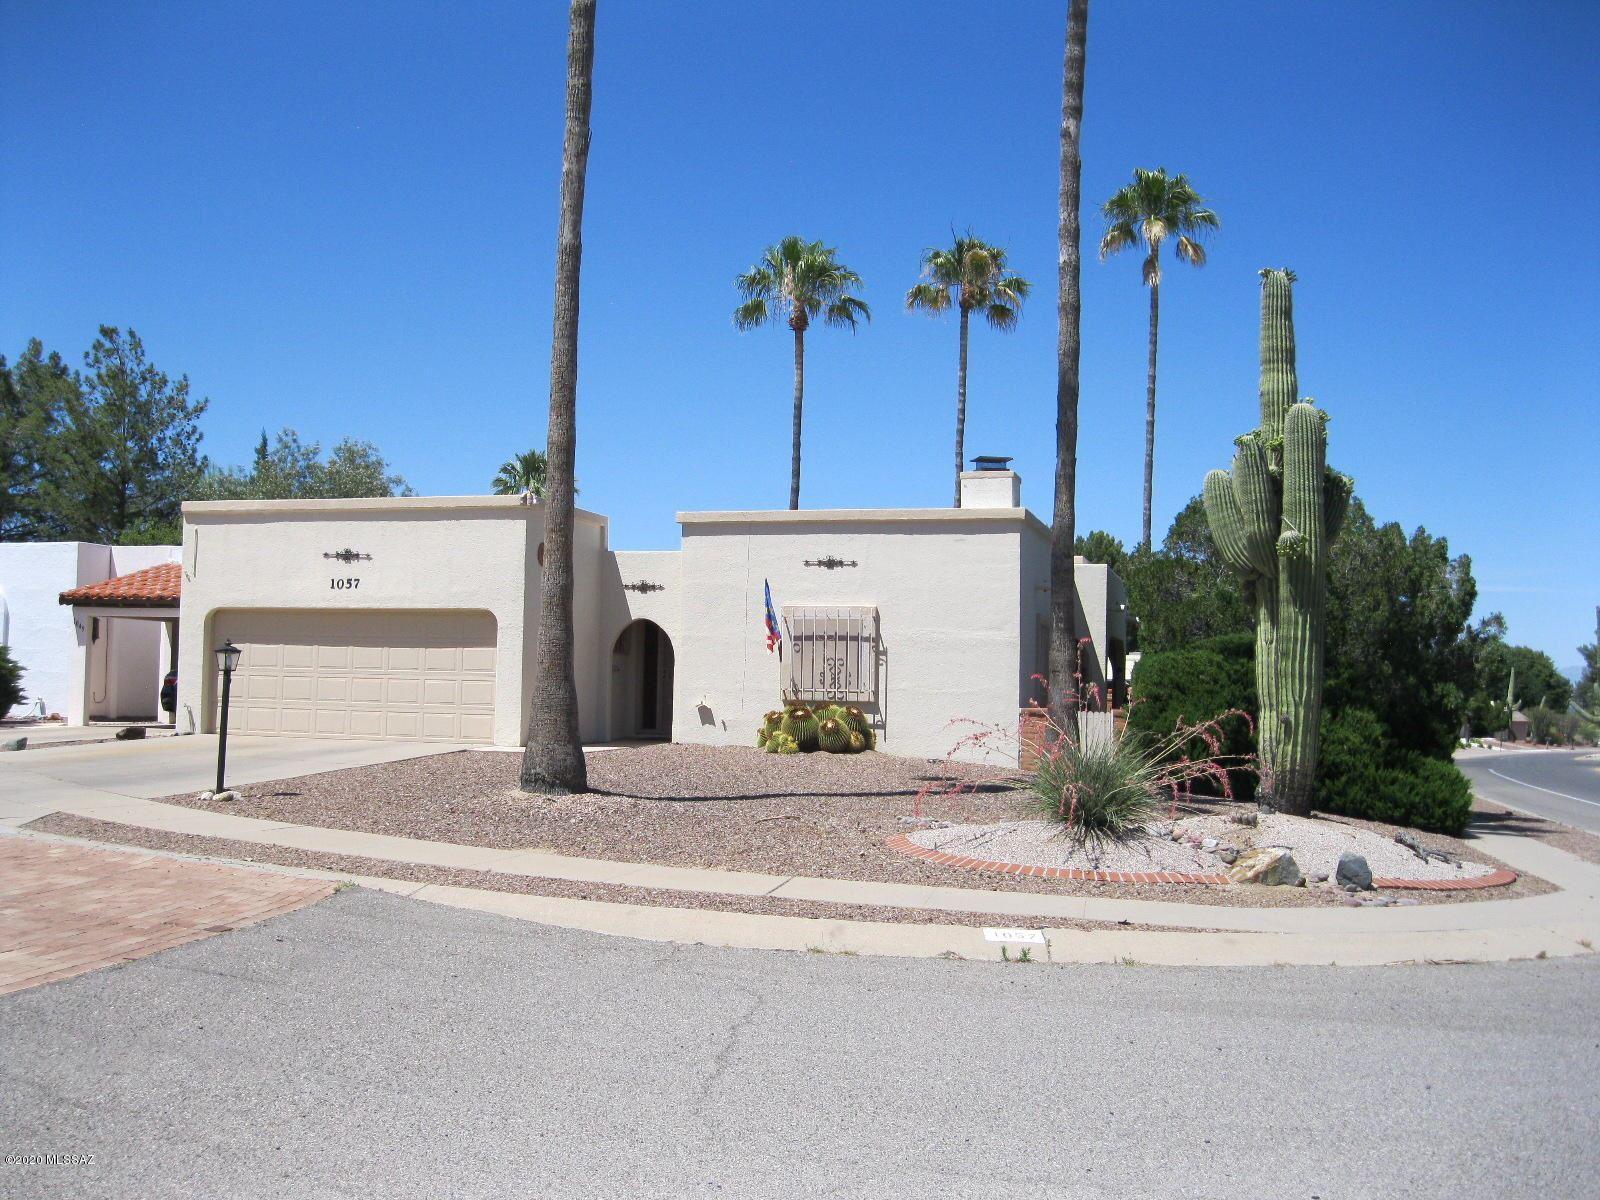 1057 N Abrego Drive, Green Valley, AZ 85614 - MLS#: 22013618